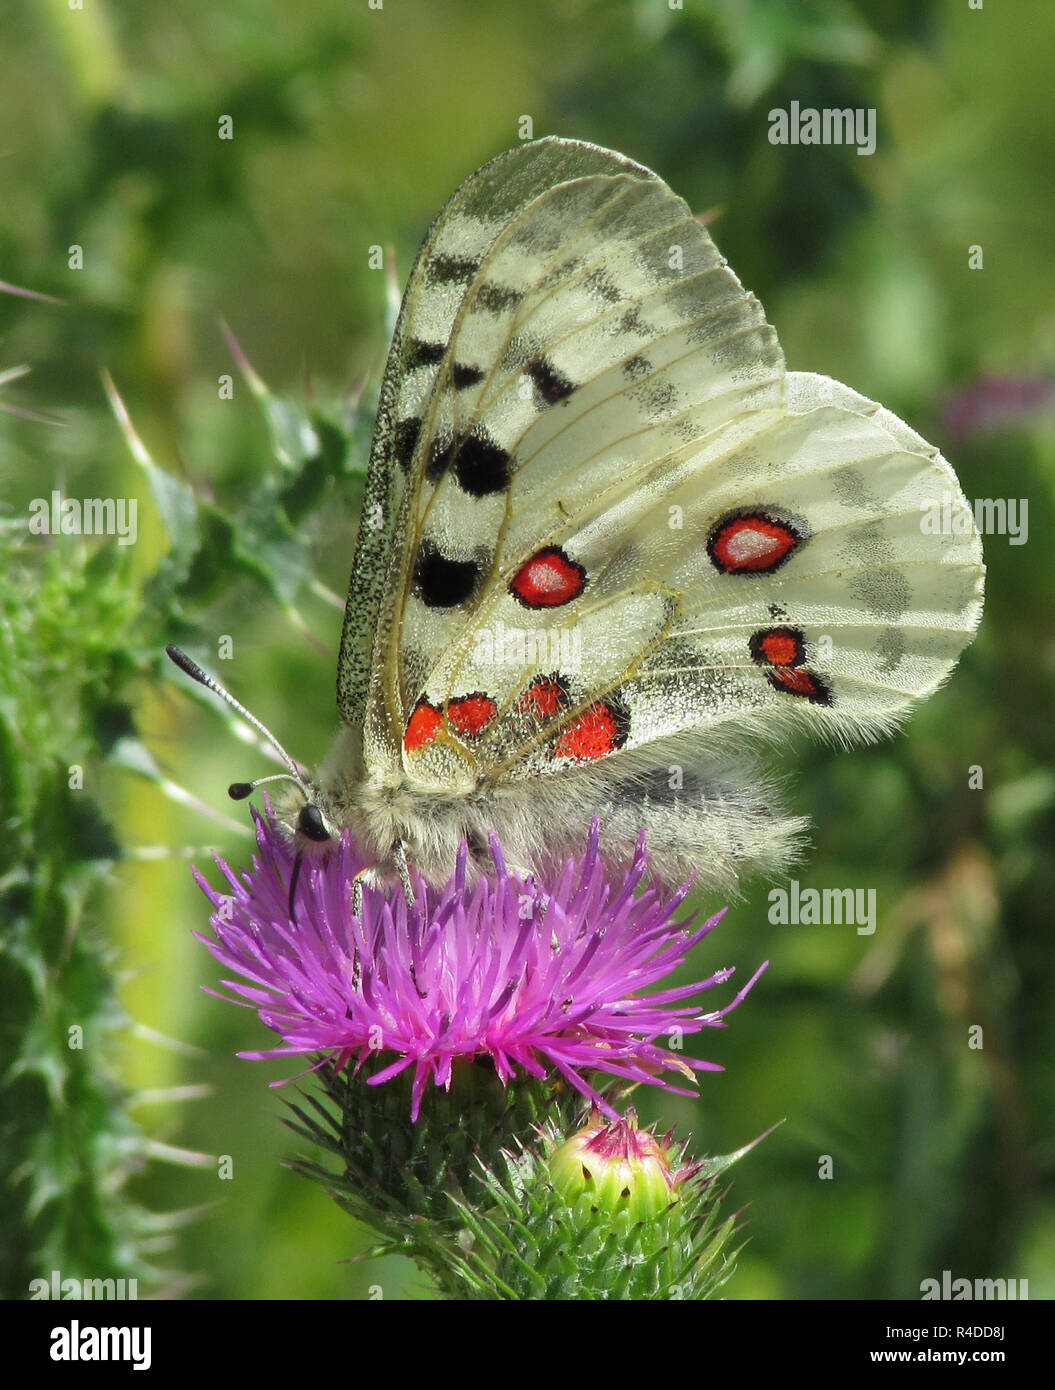 apollo butterfly in altmühltal,bottom,on purple thistle bloom Stock Photo